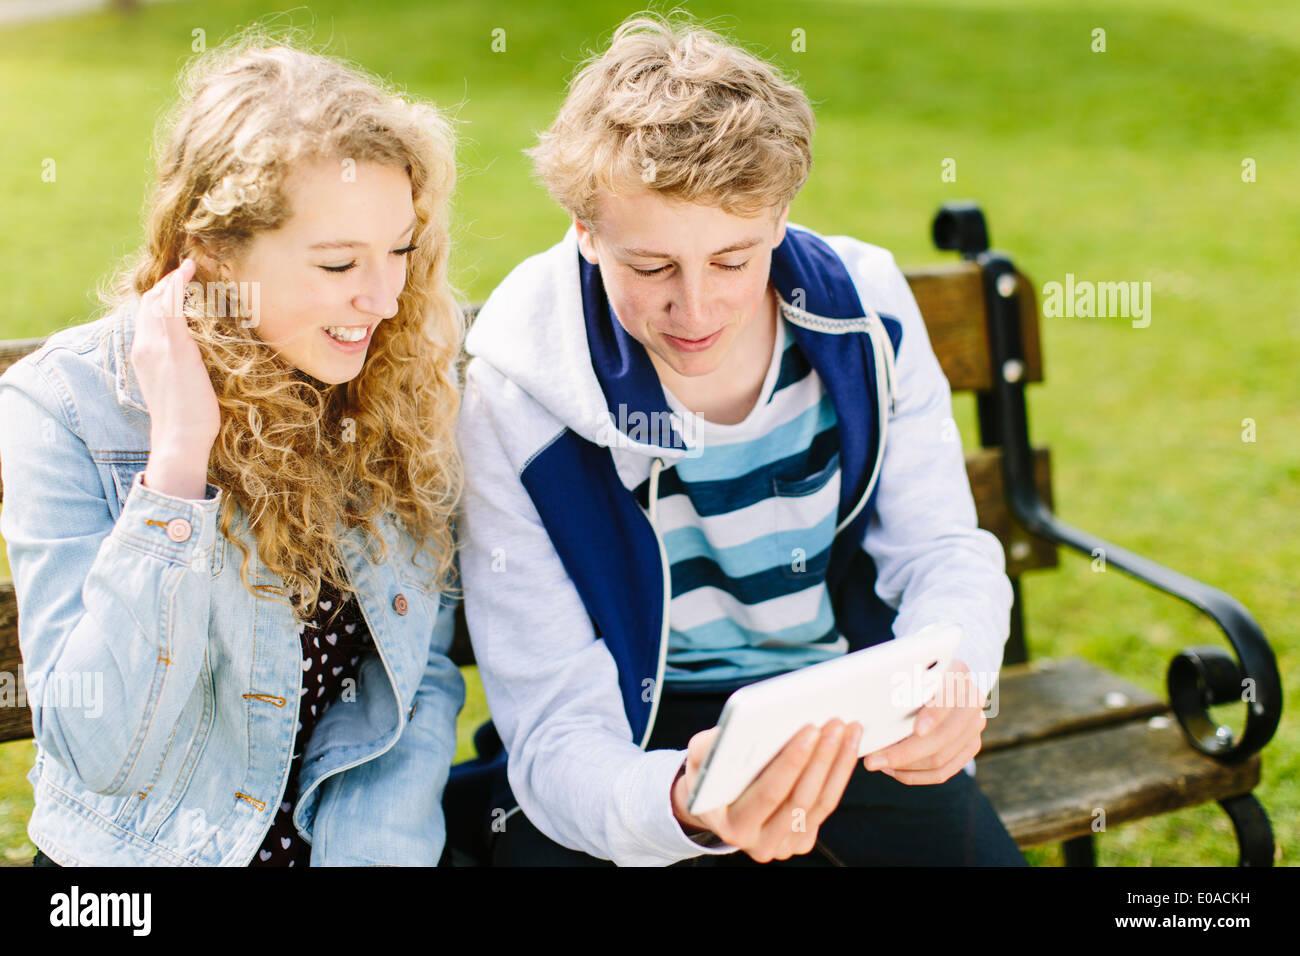 Teenager Geschwister Blick auf digital-Tablette auf Bank Stockbild